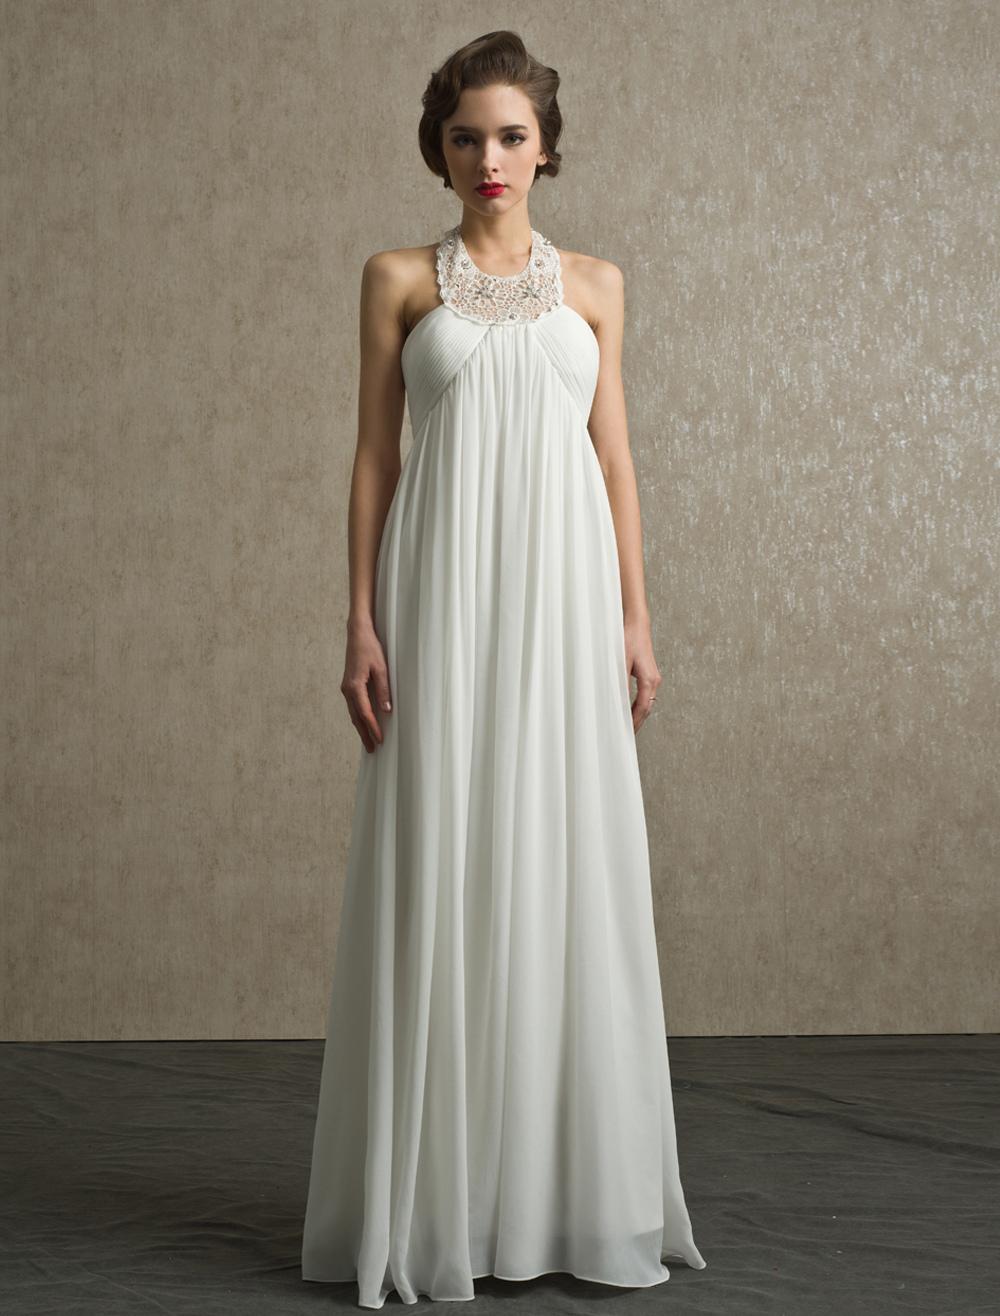 Boho Beach Wedding Dress A-line Floor-Length Ivory Rhinestone Bridal Wedding Gown With Halter Neck